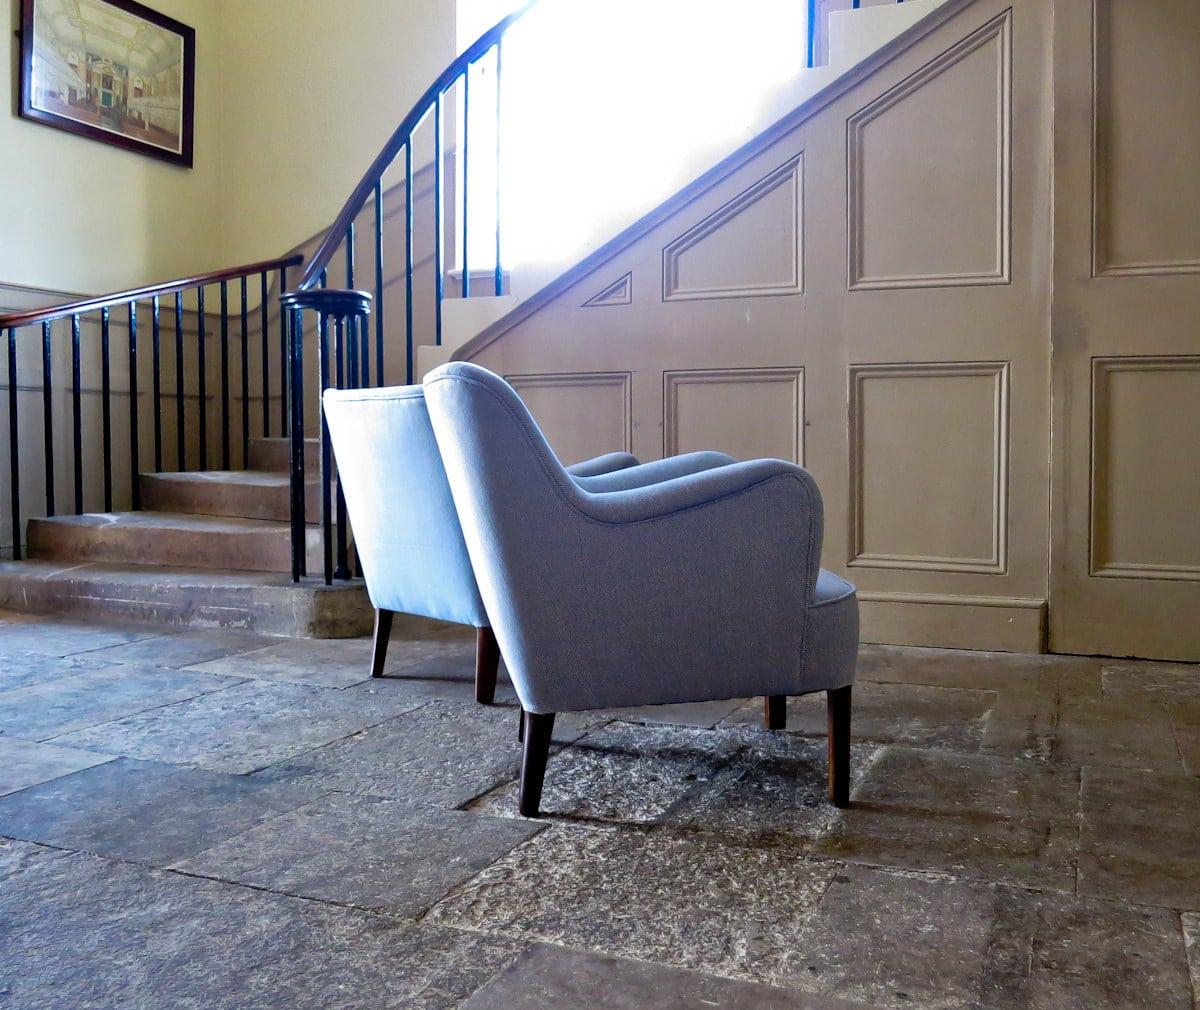 Hvidt Molgaard Nielsen Danish furniture UK armchair